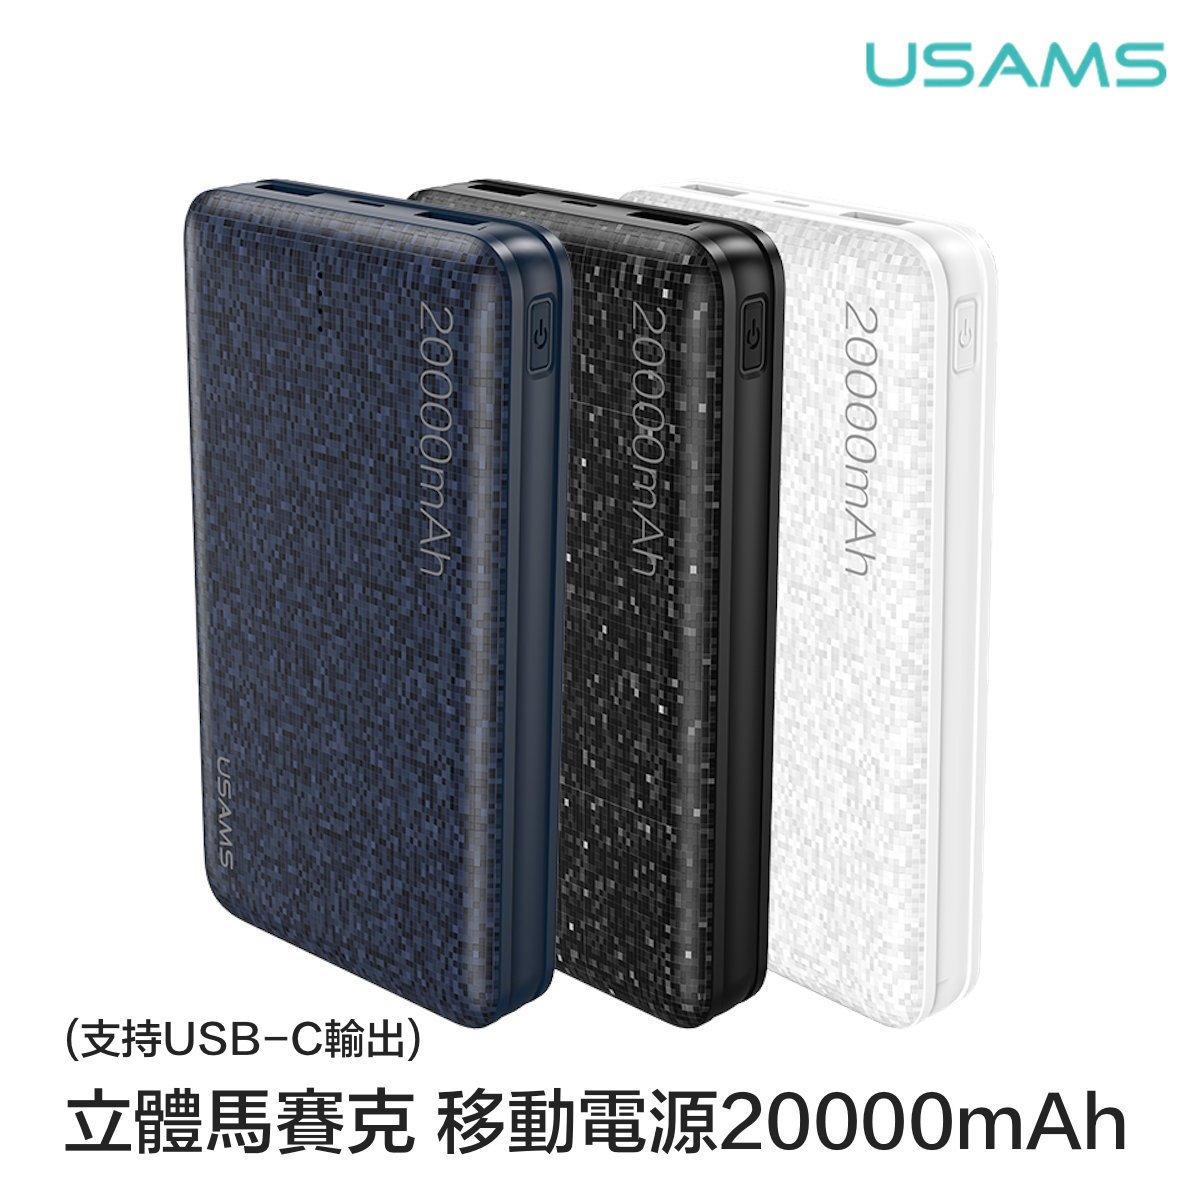 PowerBank USAMS US-CD32 20000mAh, black